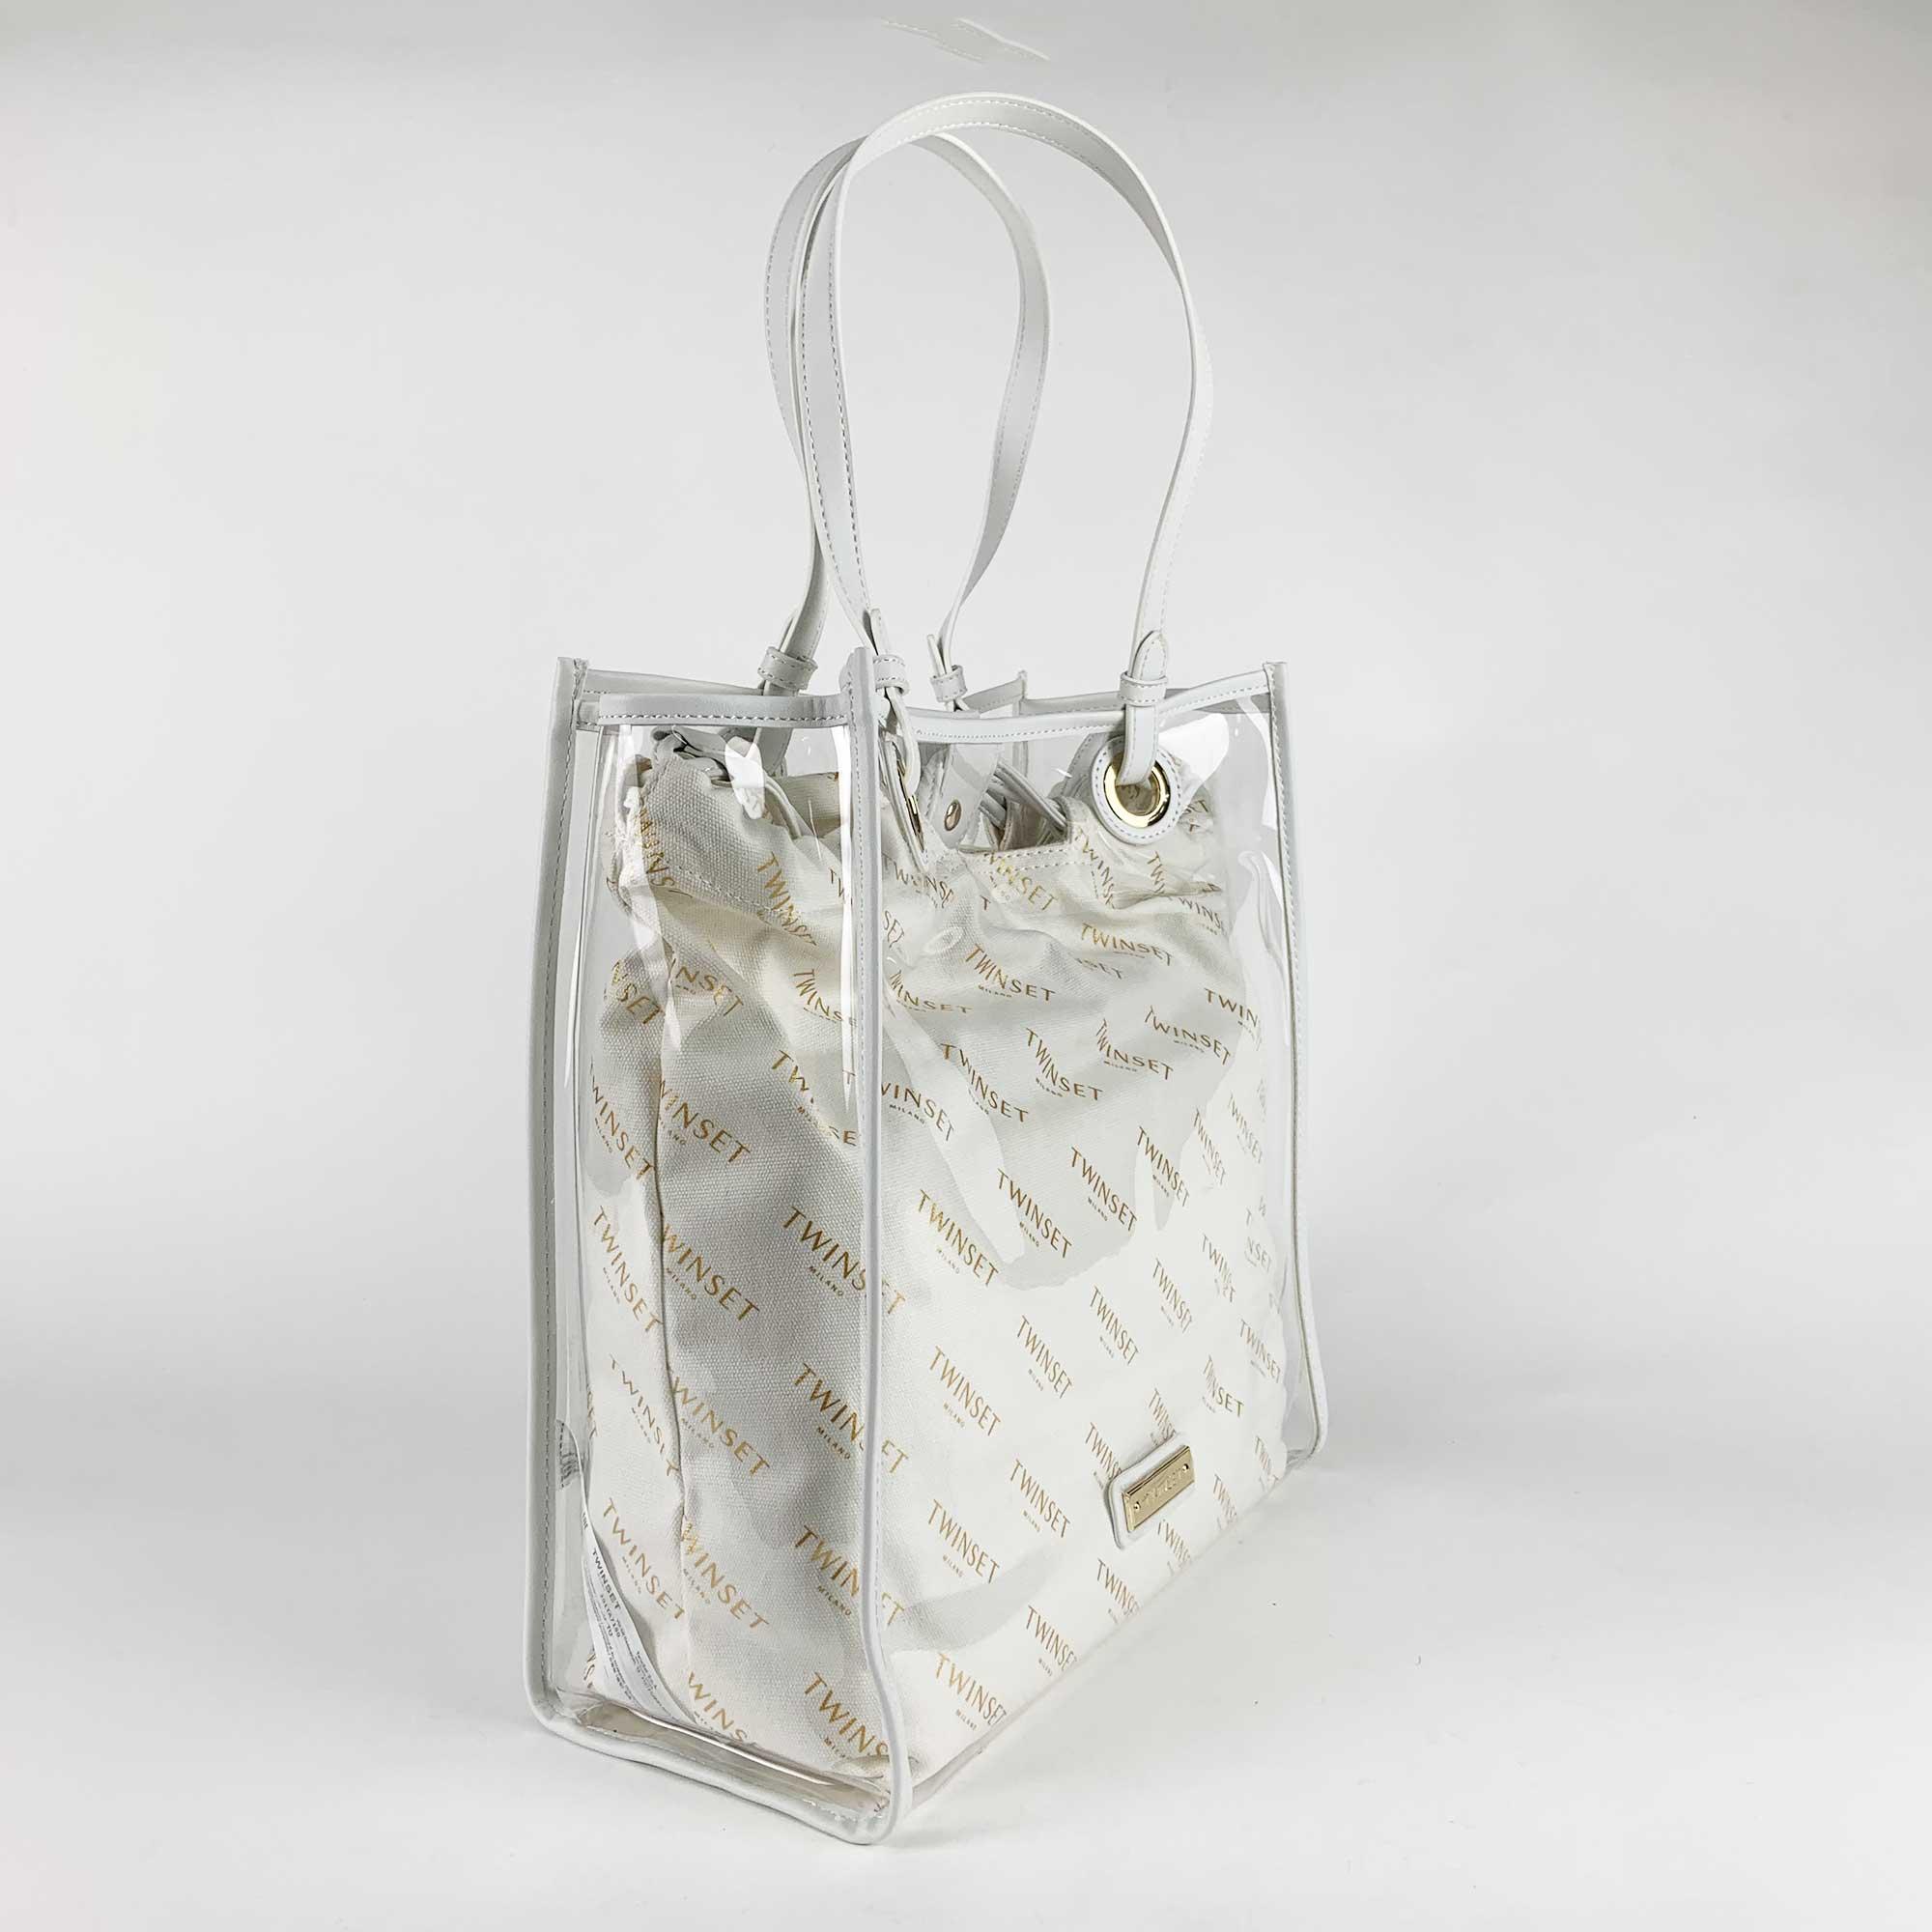 Borsa shopper con sacca  logata - Bianco